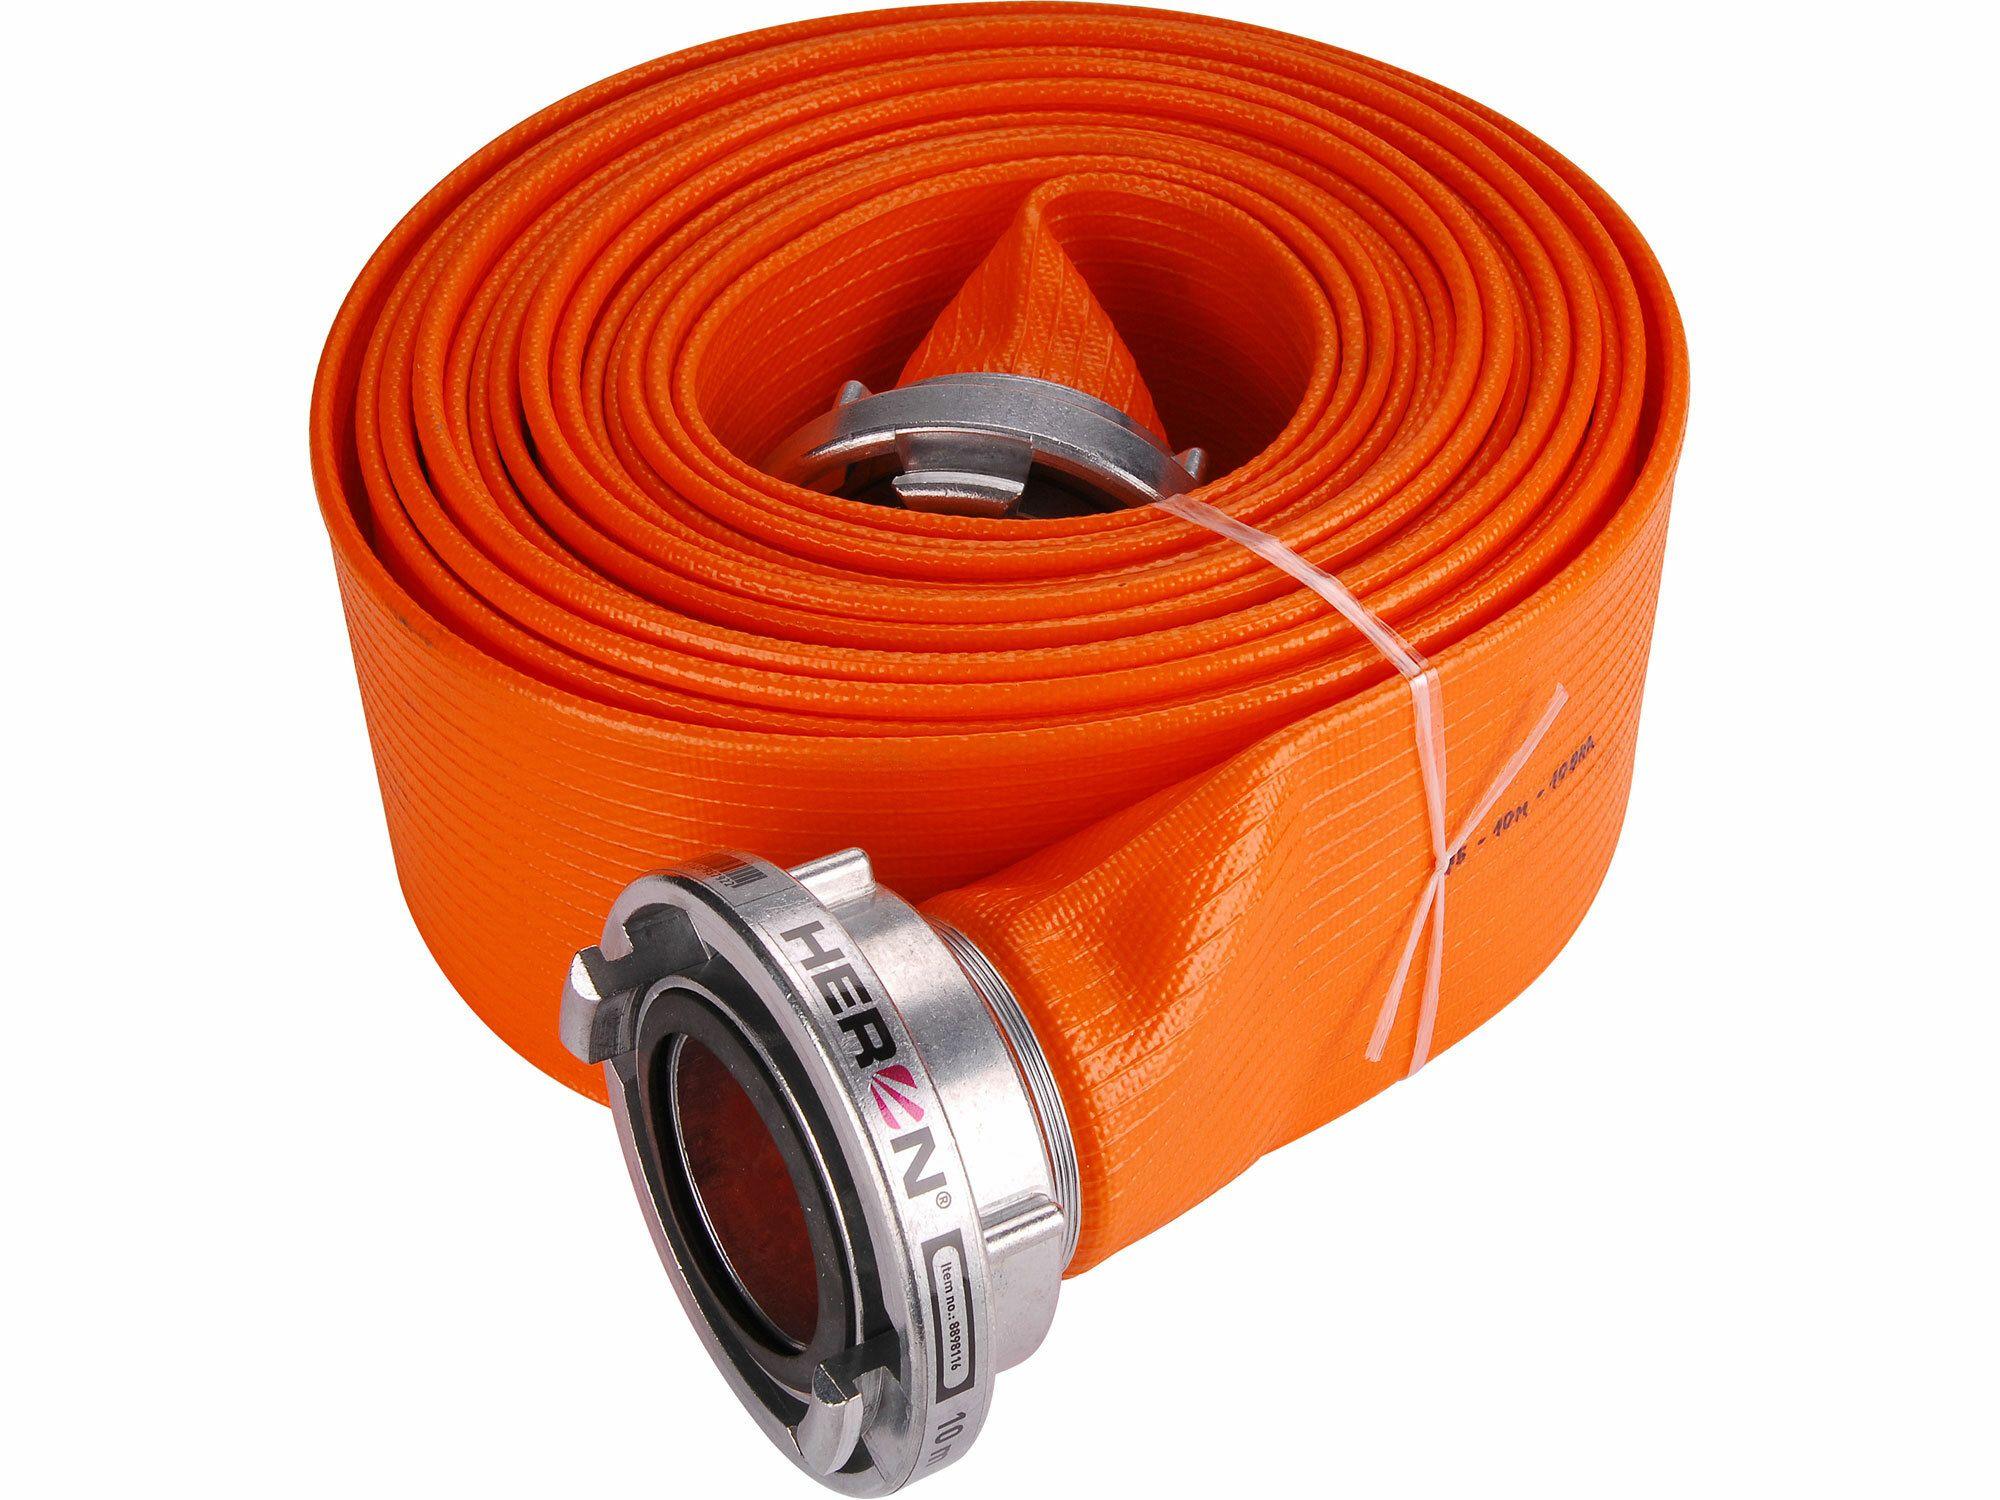 "Hadice B75 PVC Orange 10m se spojkami, 3"", 10m, pro 8895106, 8895105, 8895102, HERON"